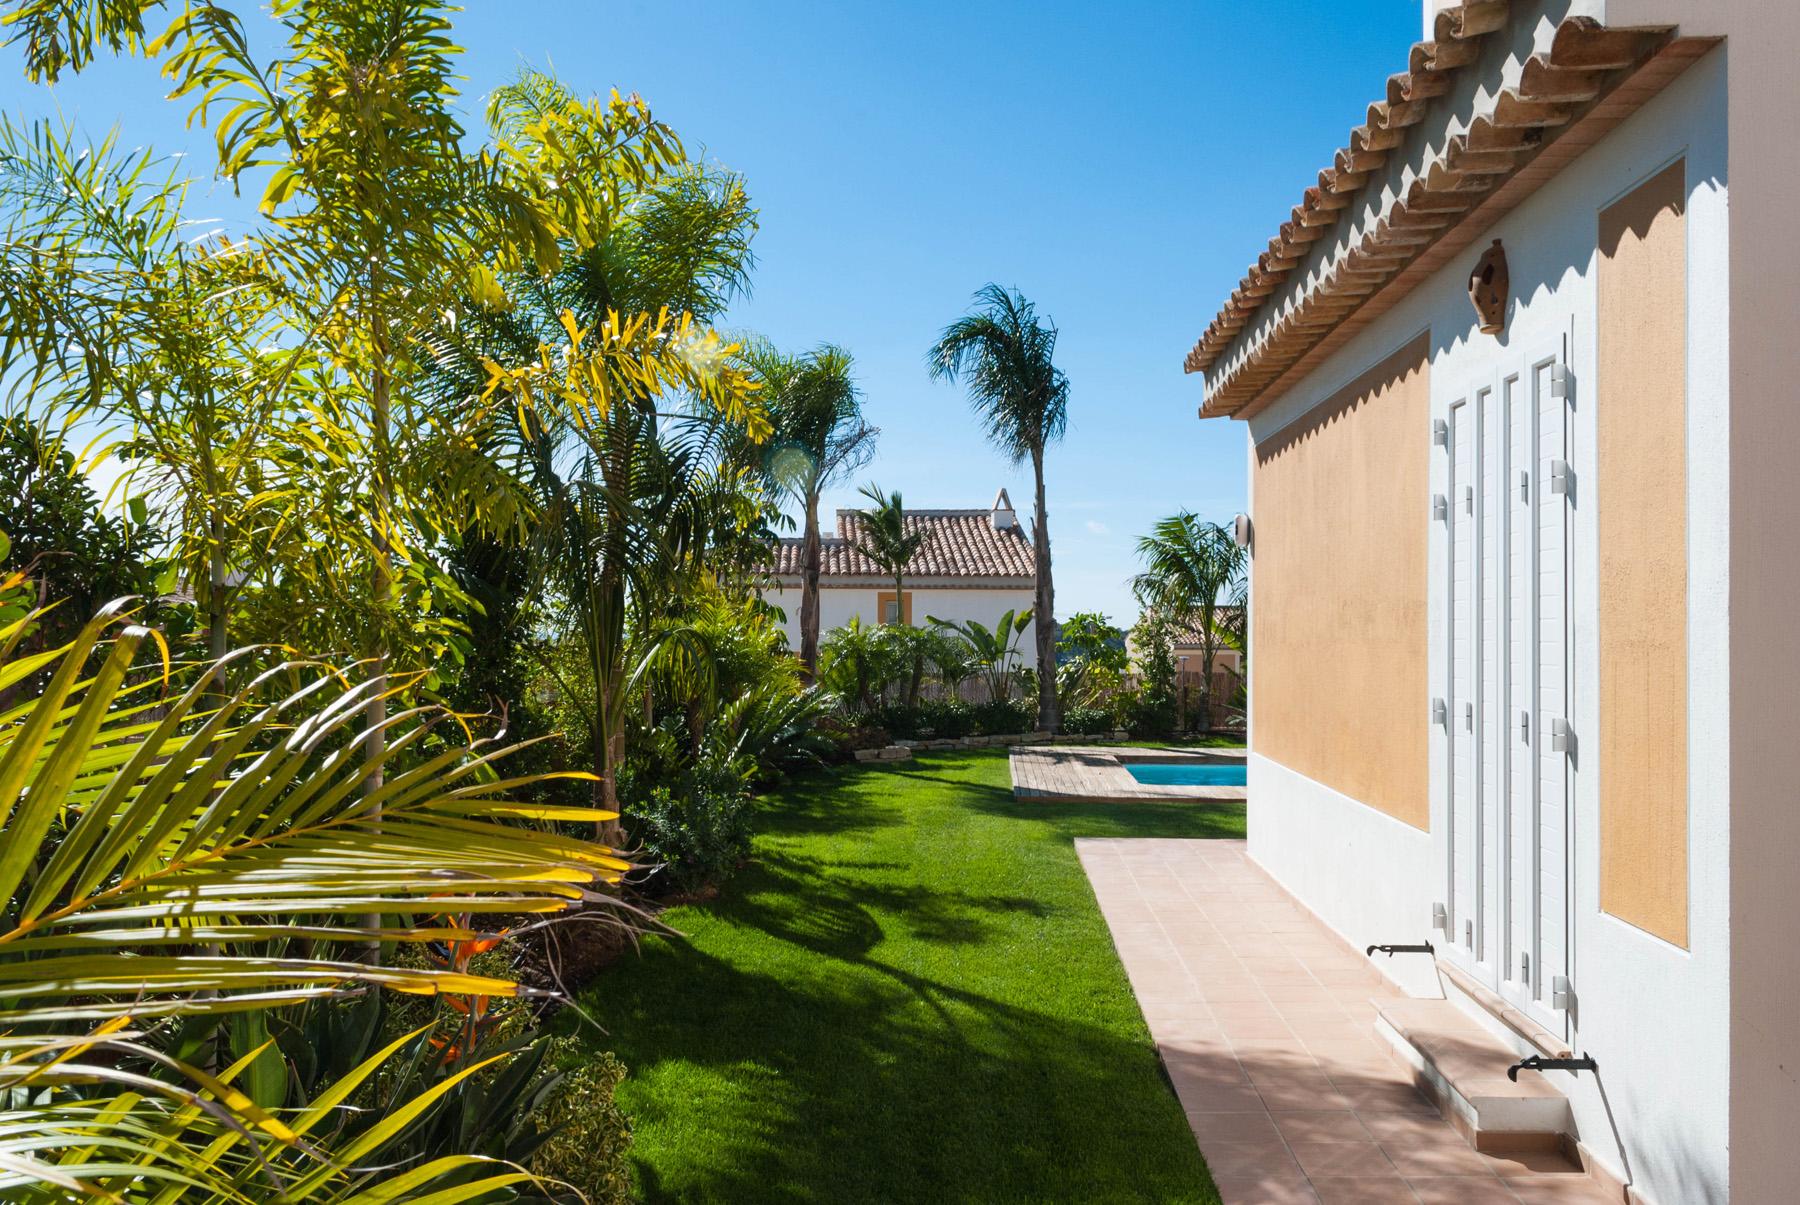 Jardin de diseno subtropical david jim nez arquitectura - Diseno jardines madrid ...